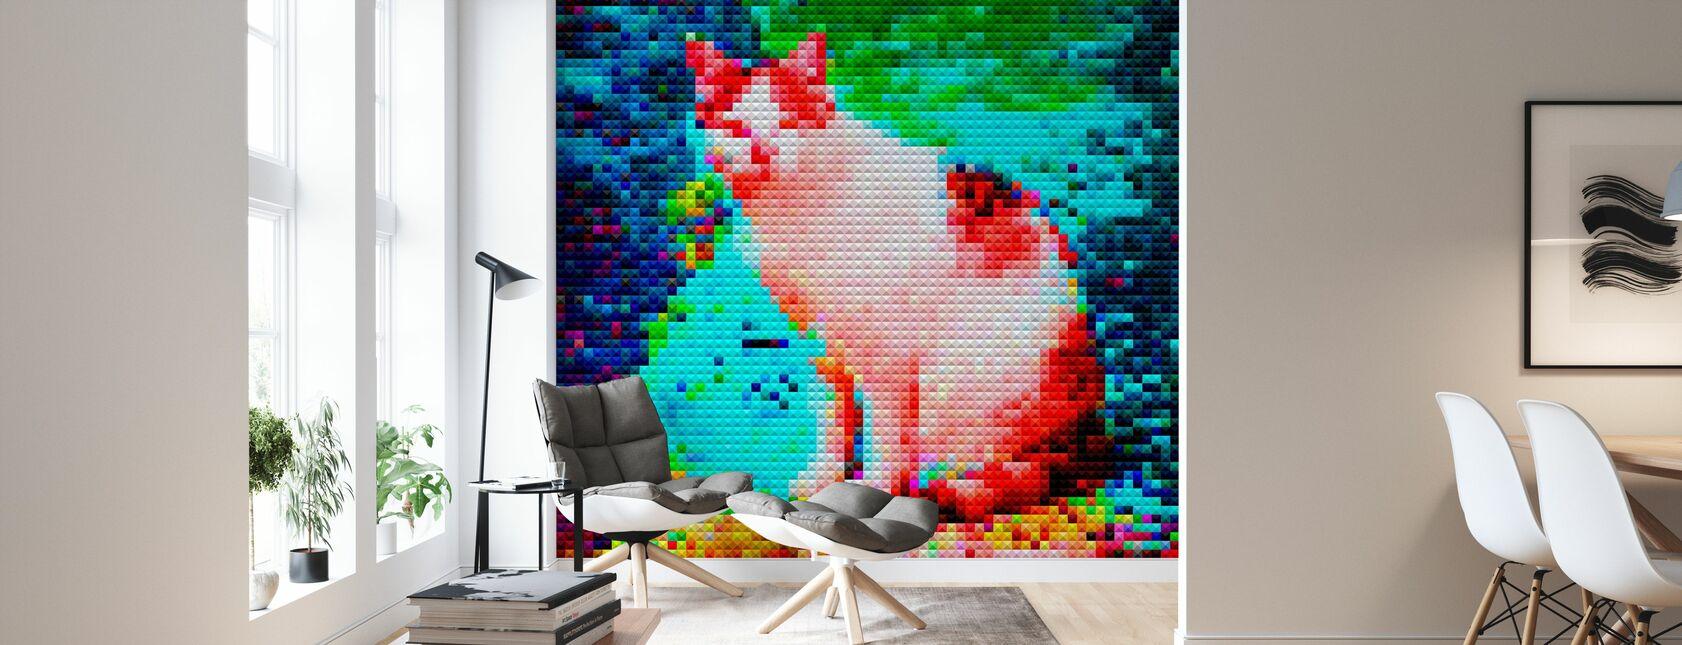 Mosaic Cat - Wallpaper - Living Room